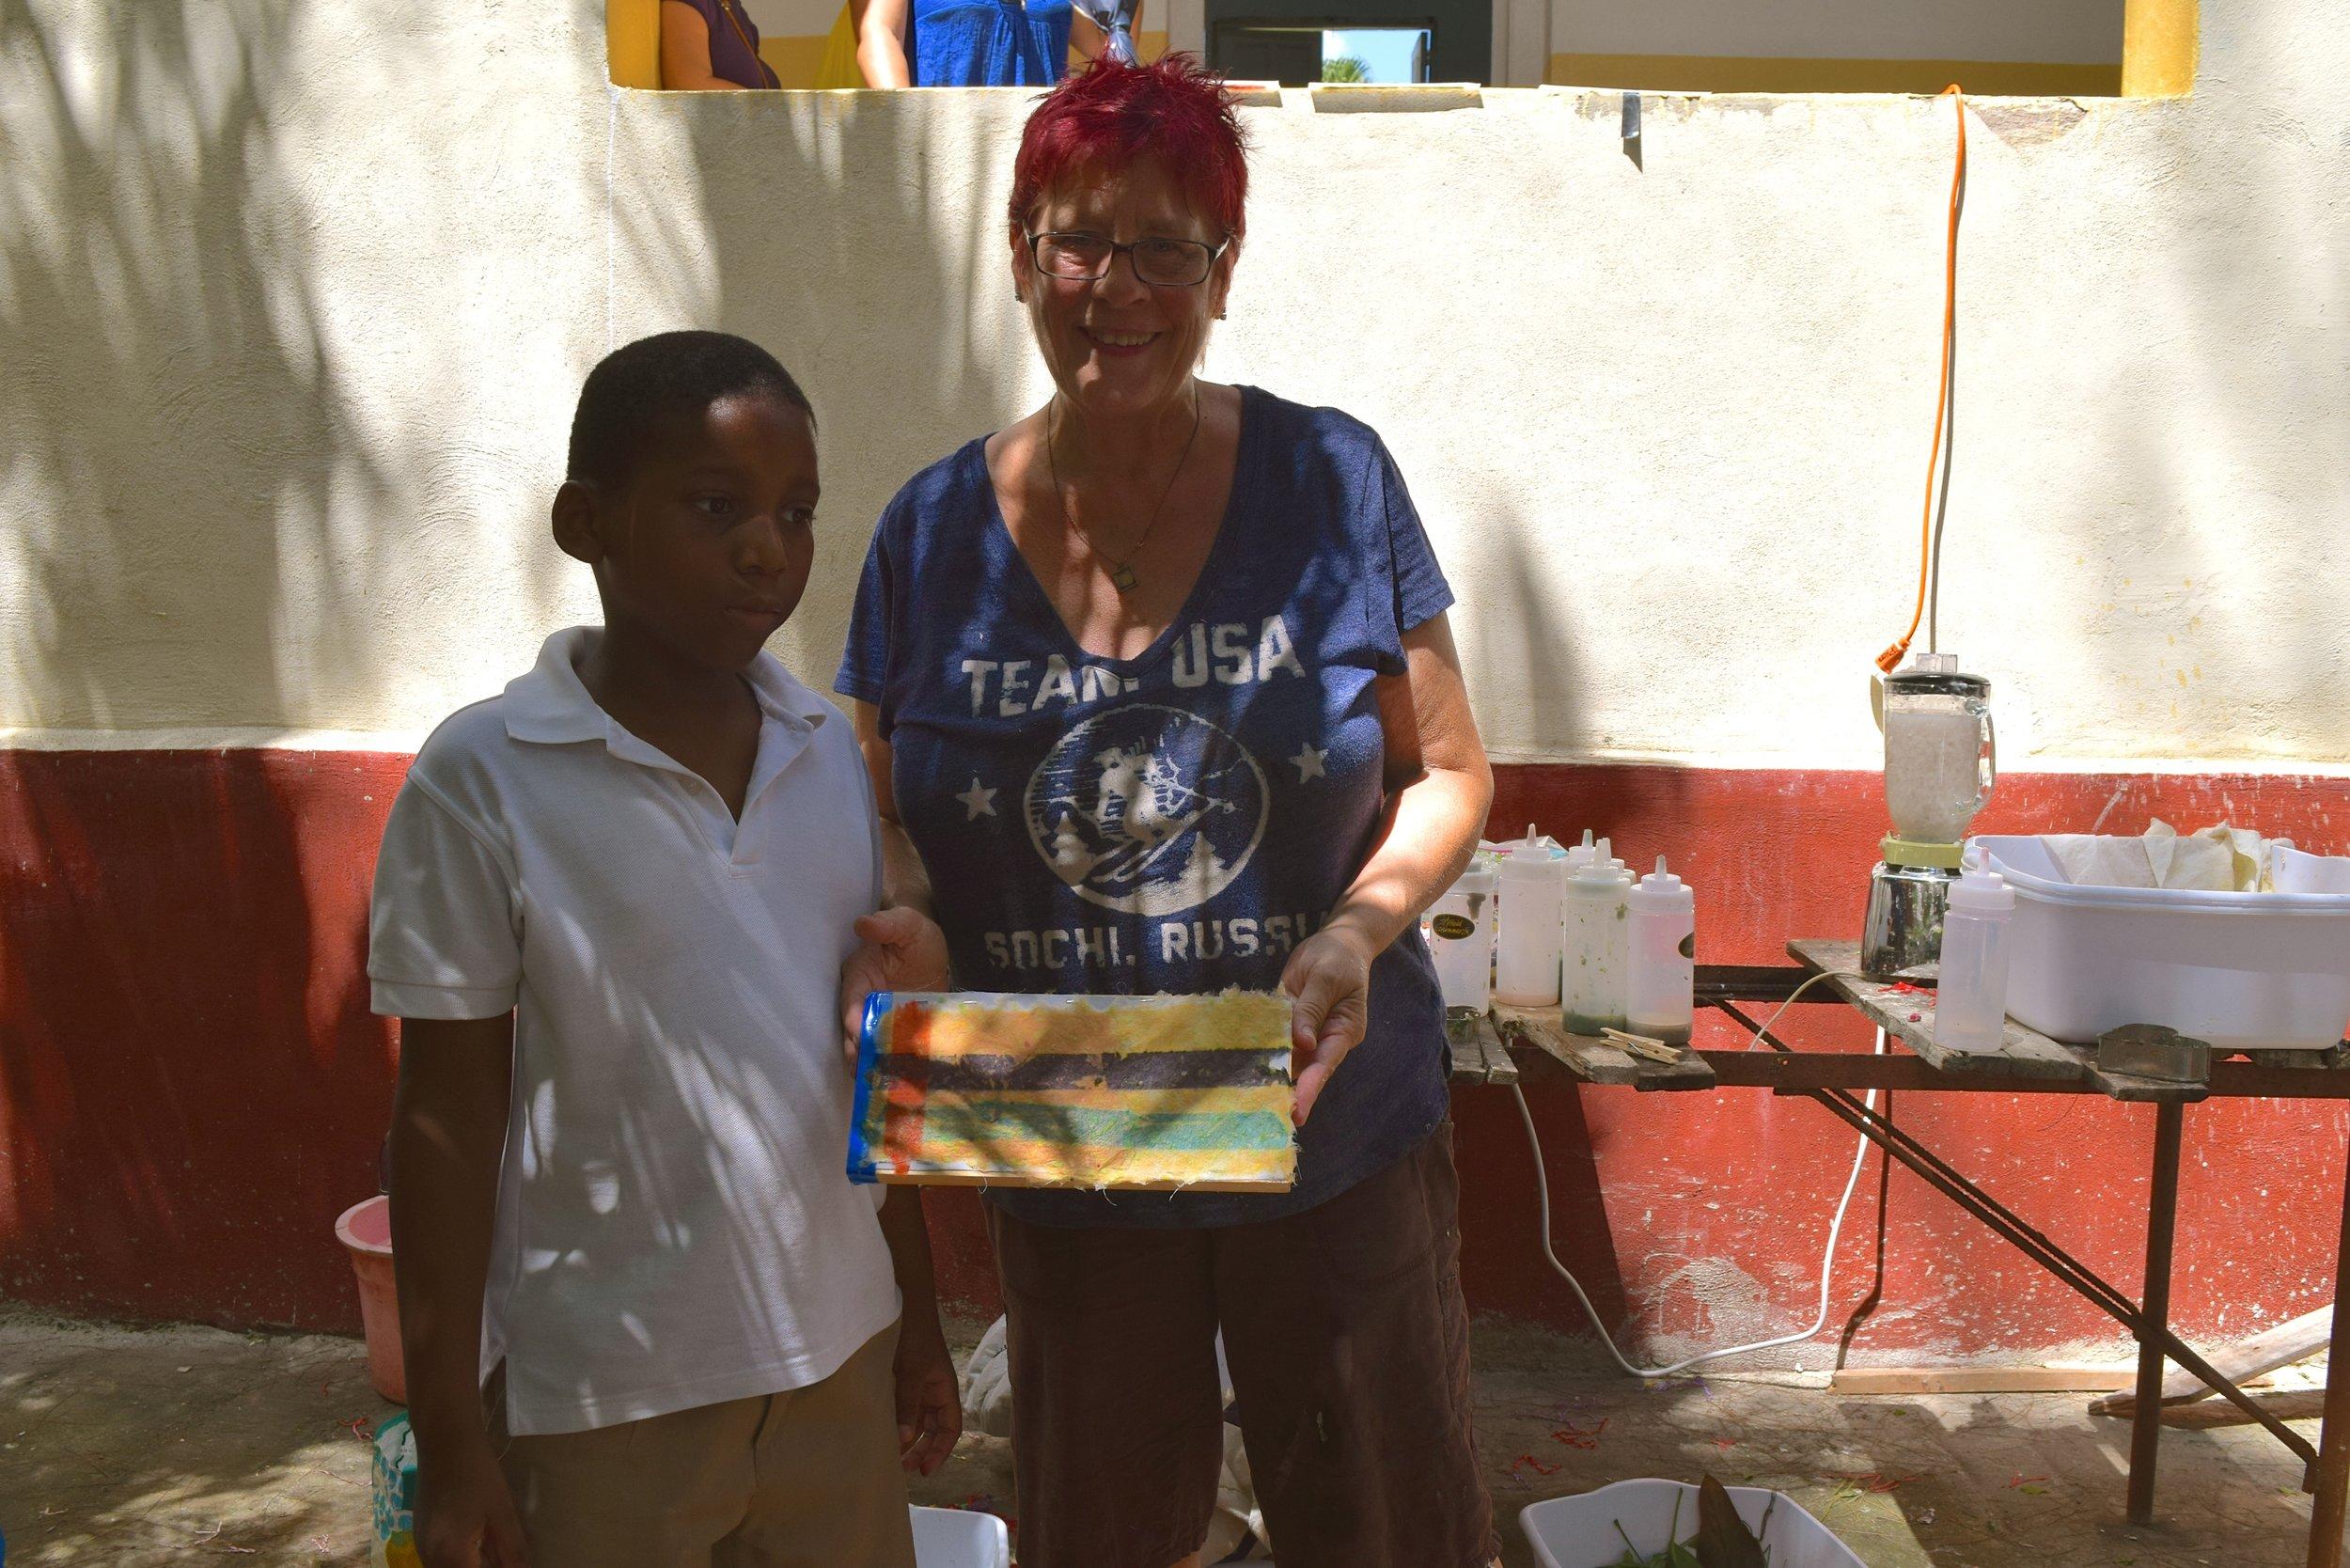 ARTIST'S MAKING CHANGES - HAVANA, CUBA